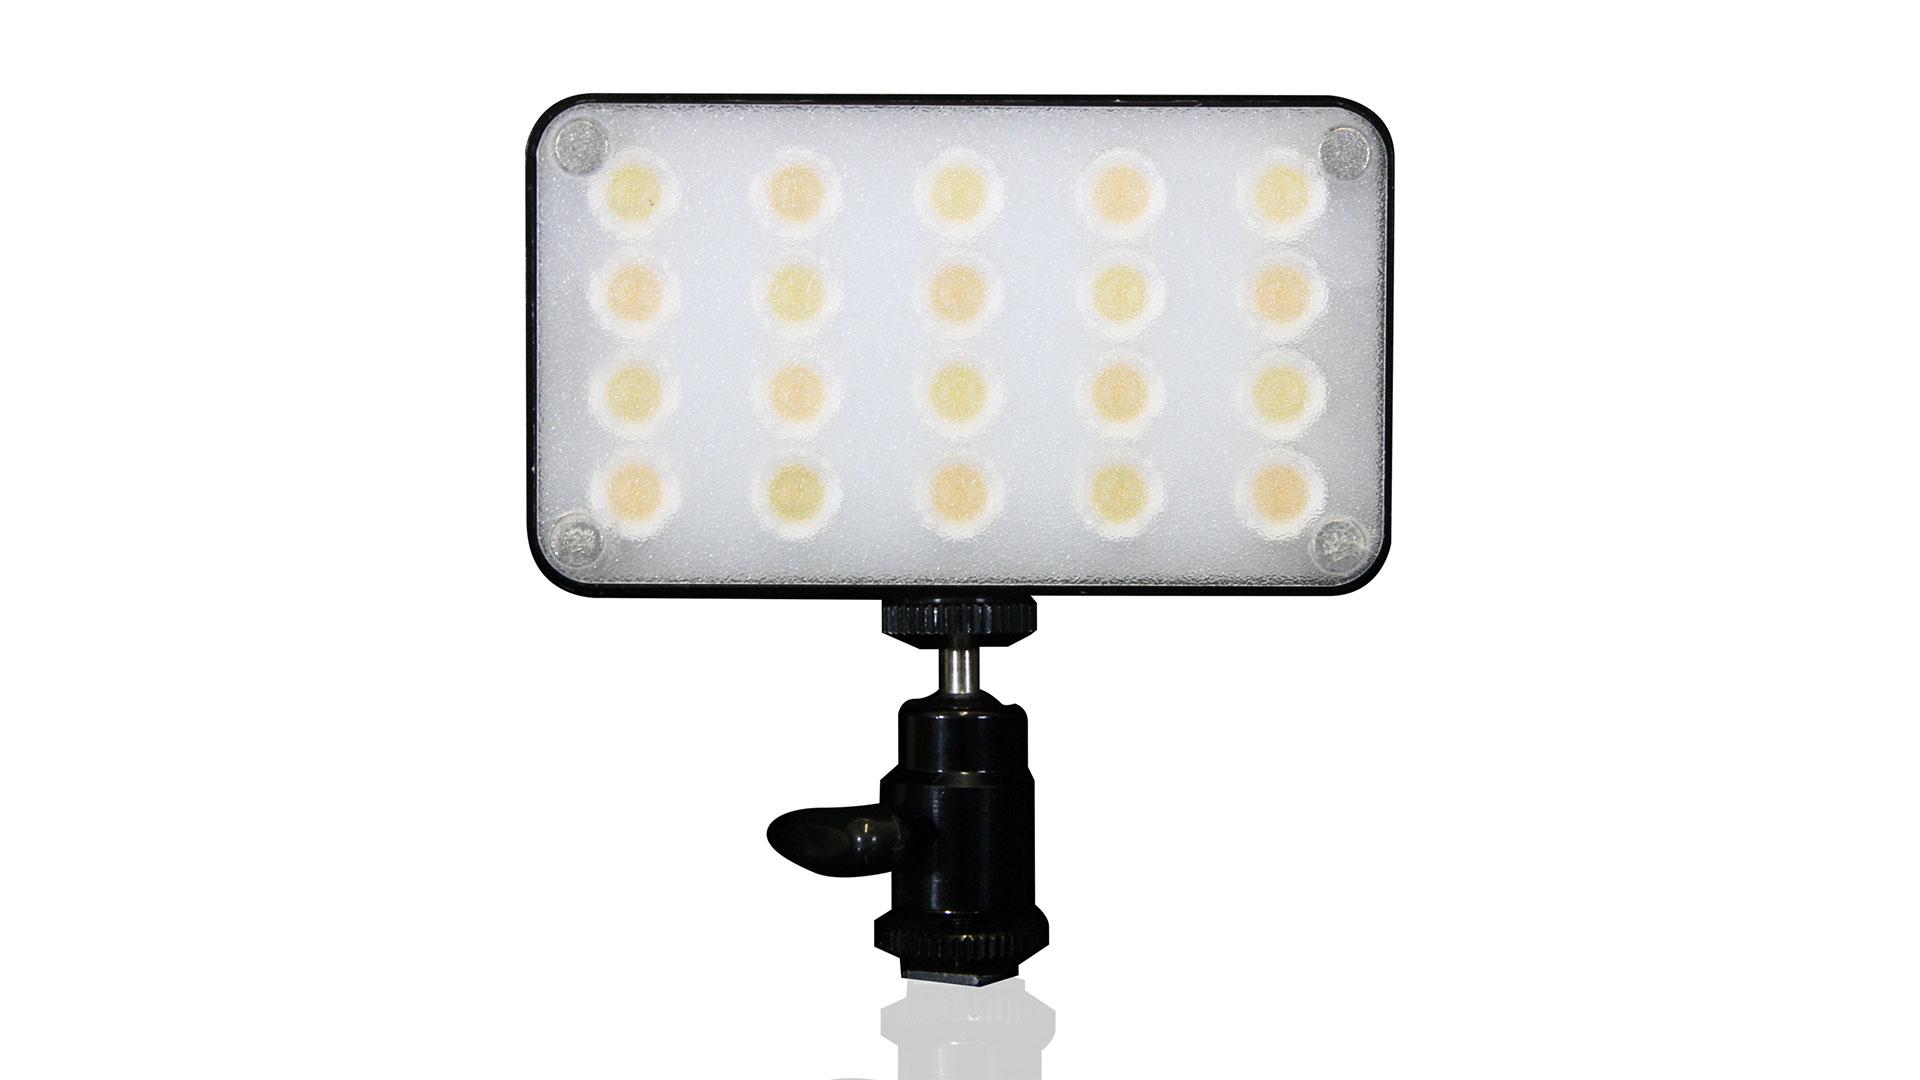 lighting kit com light of camera mytatuaggi photo x sources continuous